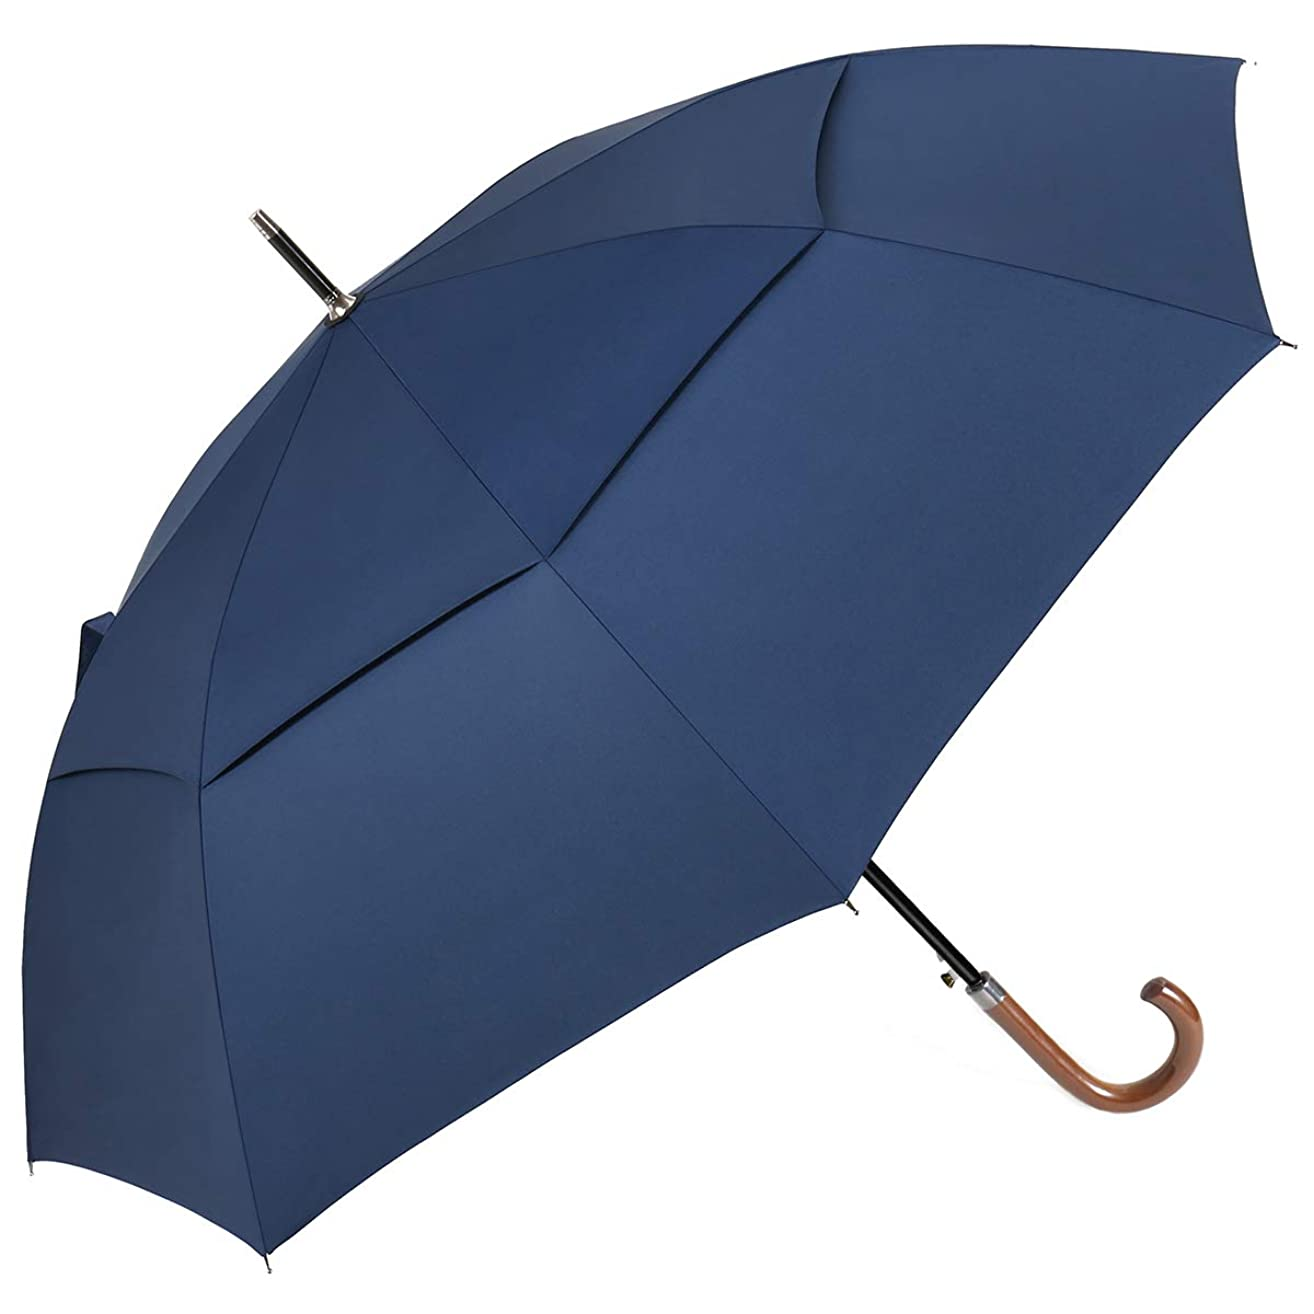 G4Free 54/62inch Wooden J-Handle UV Umbrella, Large Auto Open Sun Protection Umbrella UPF50+ Double Canopy Vented Windproof Classic Stick Cane Umbrellas for Men Women,Gentlemen and Ladies